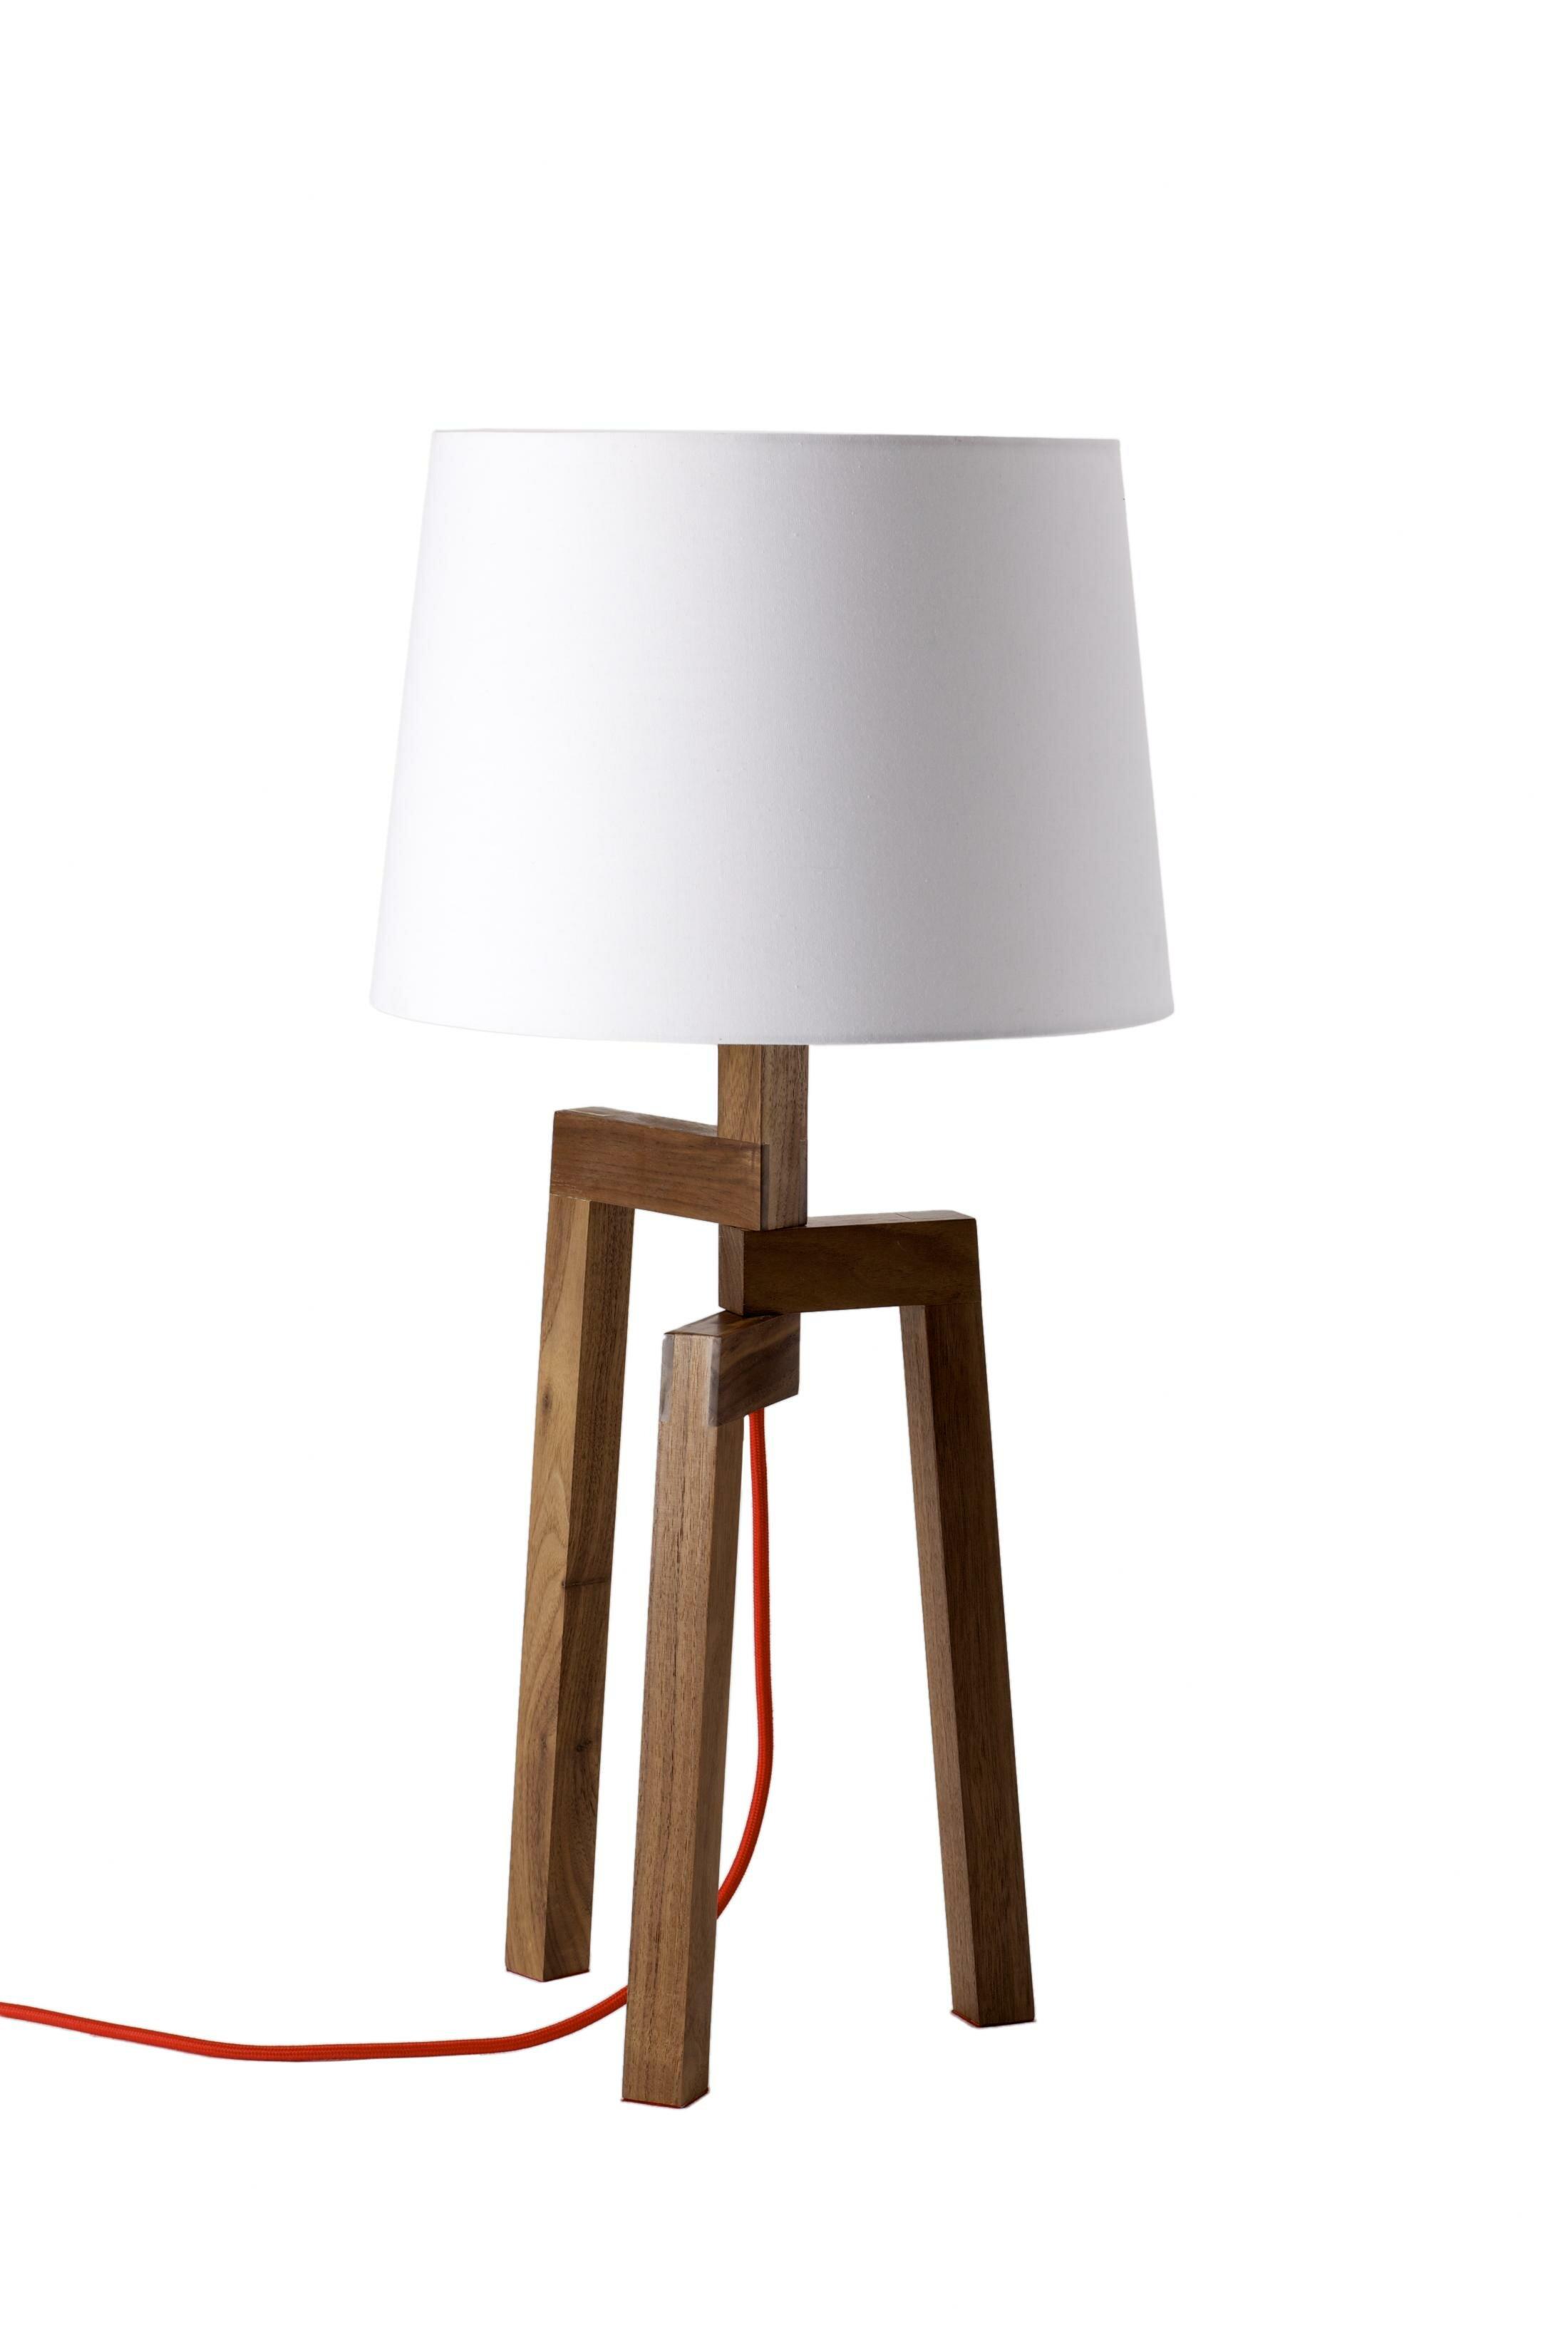 Stilt 28 tripod table lamp reviews allmodern aloadofball Image collections